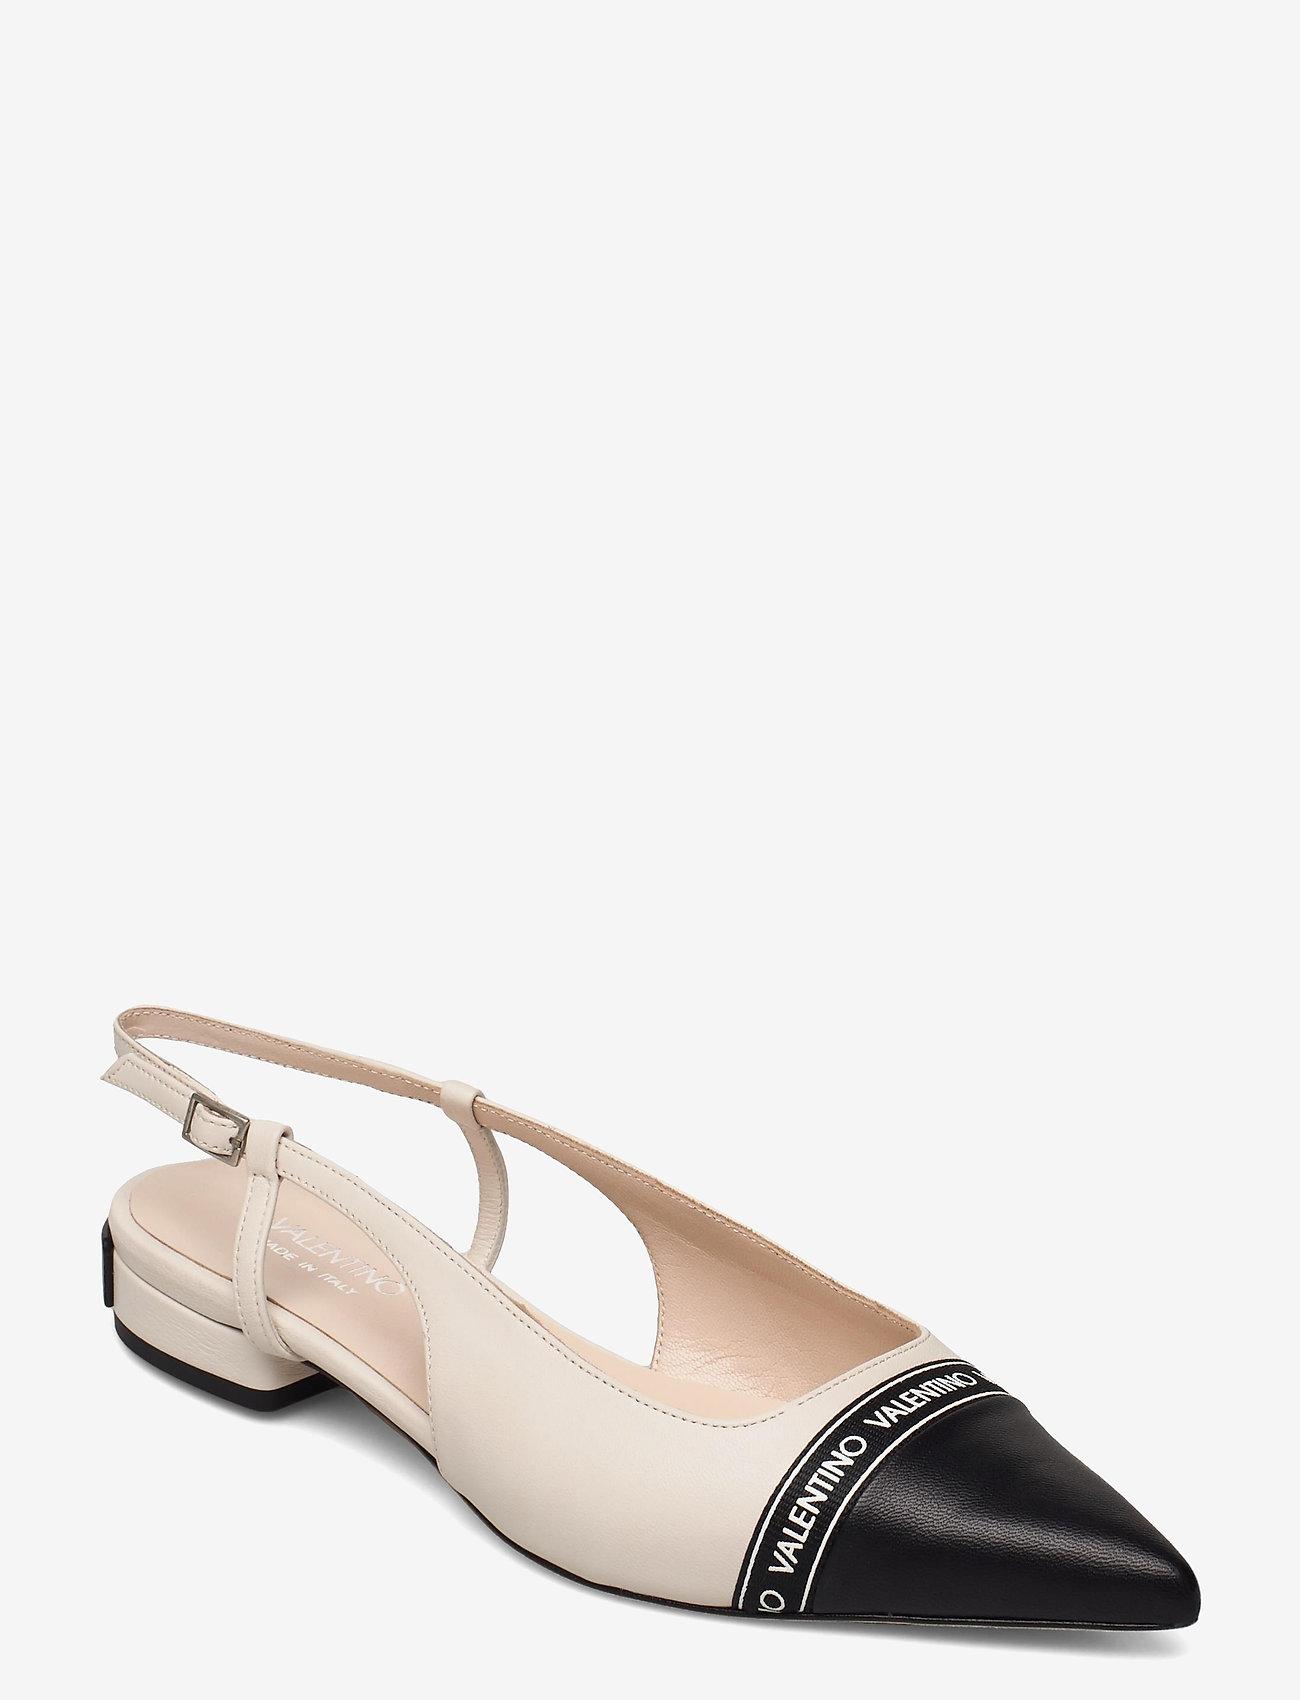 Valentino Shoes - SLINGBACK - ballerinas - white - 0